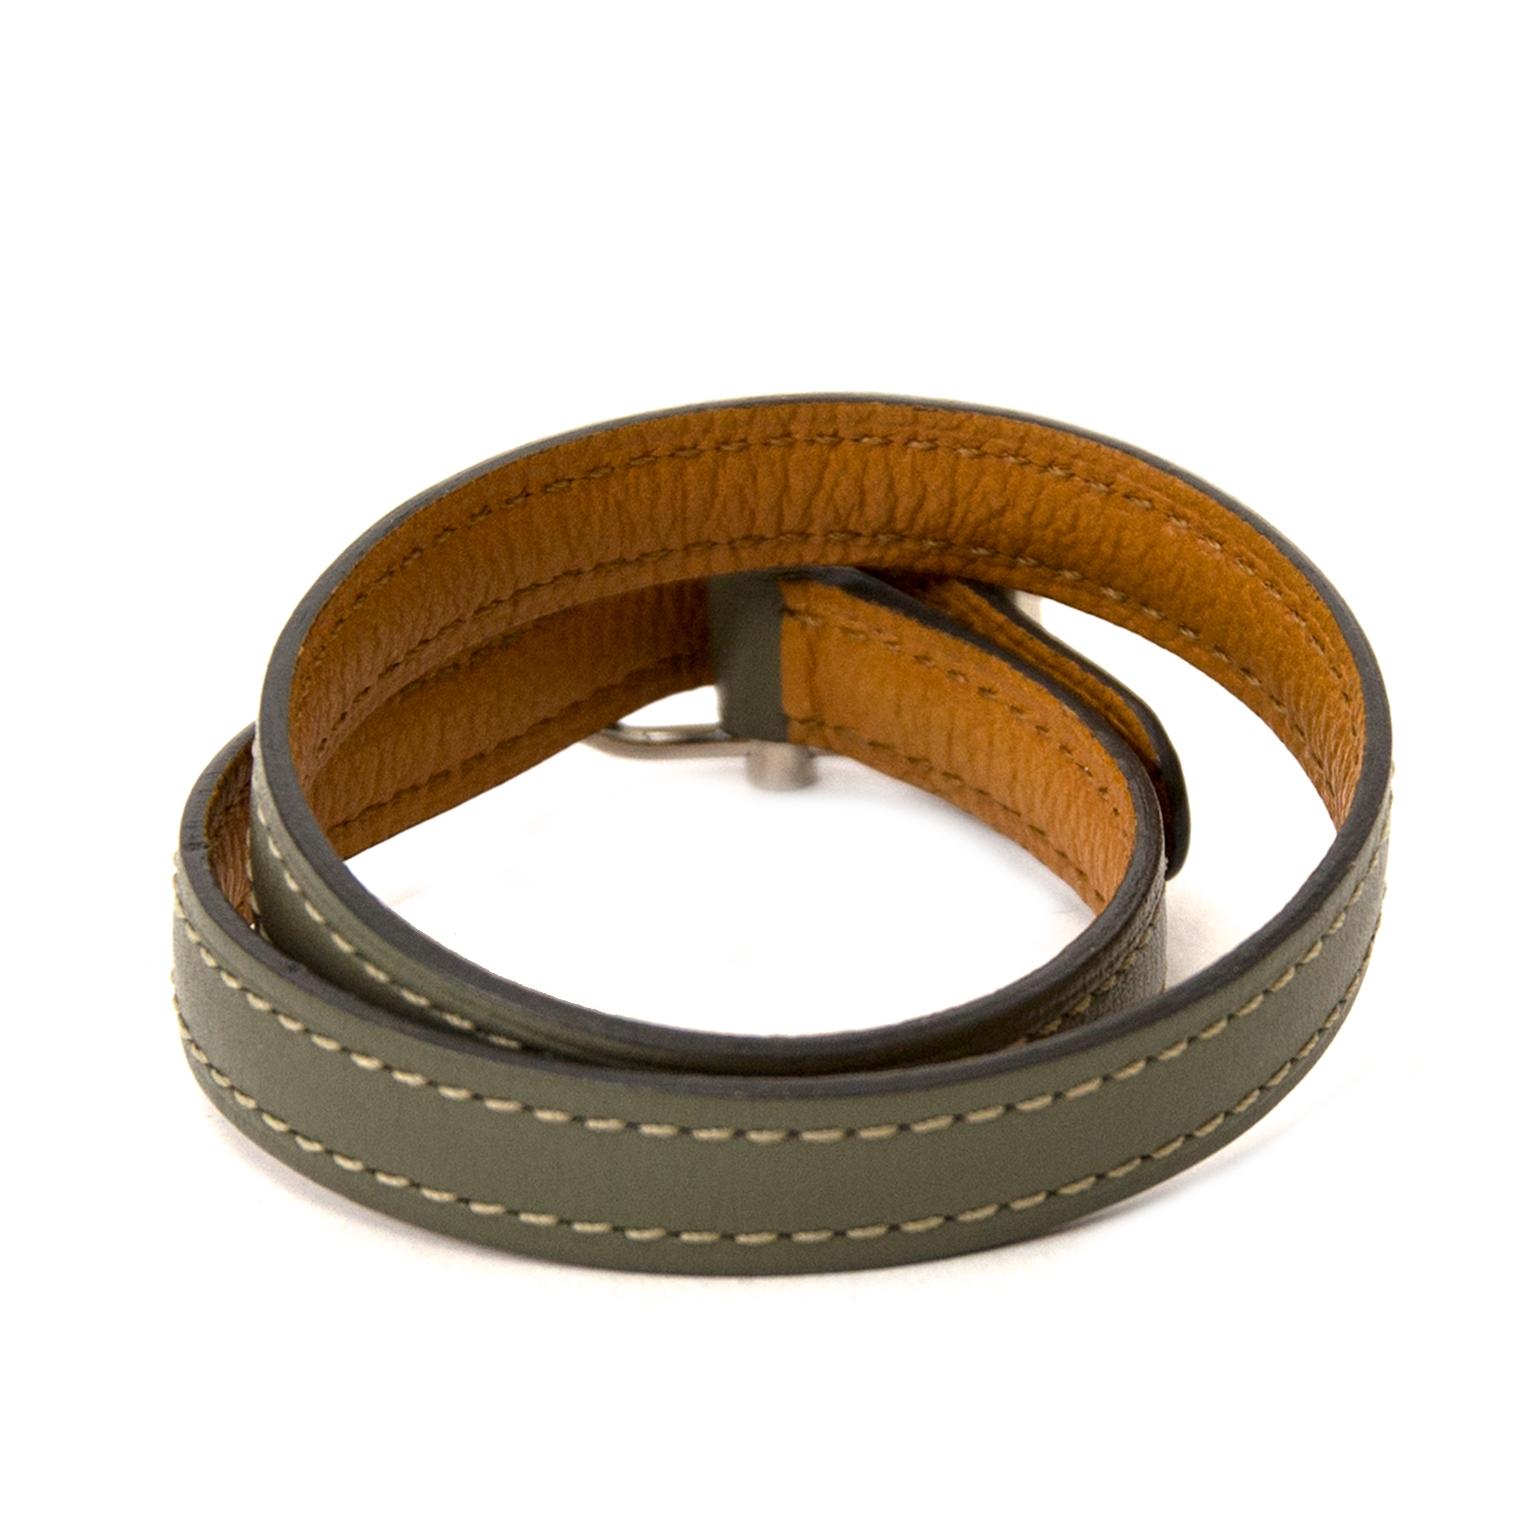 Koop delvaux doubletour armbanden bij labellov vintage mode webshop